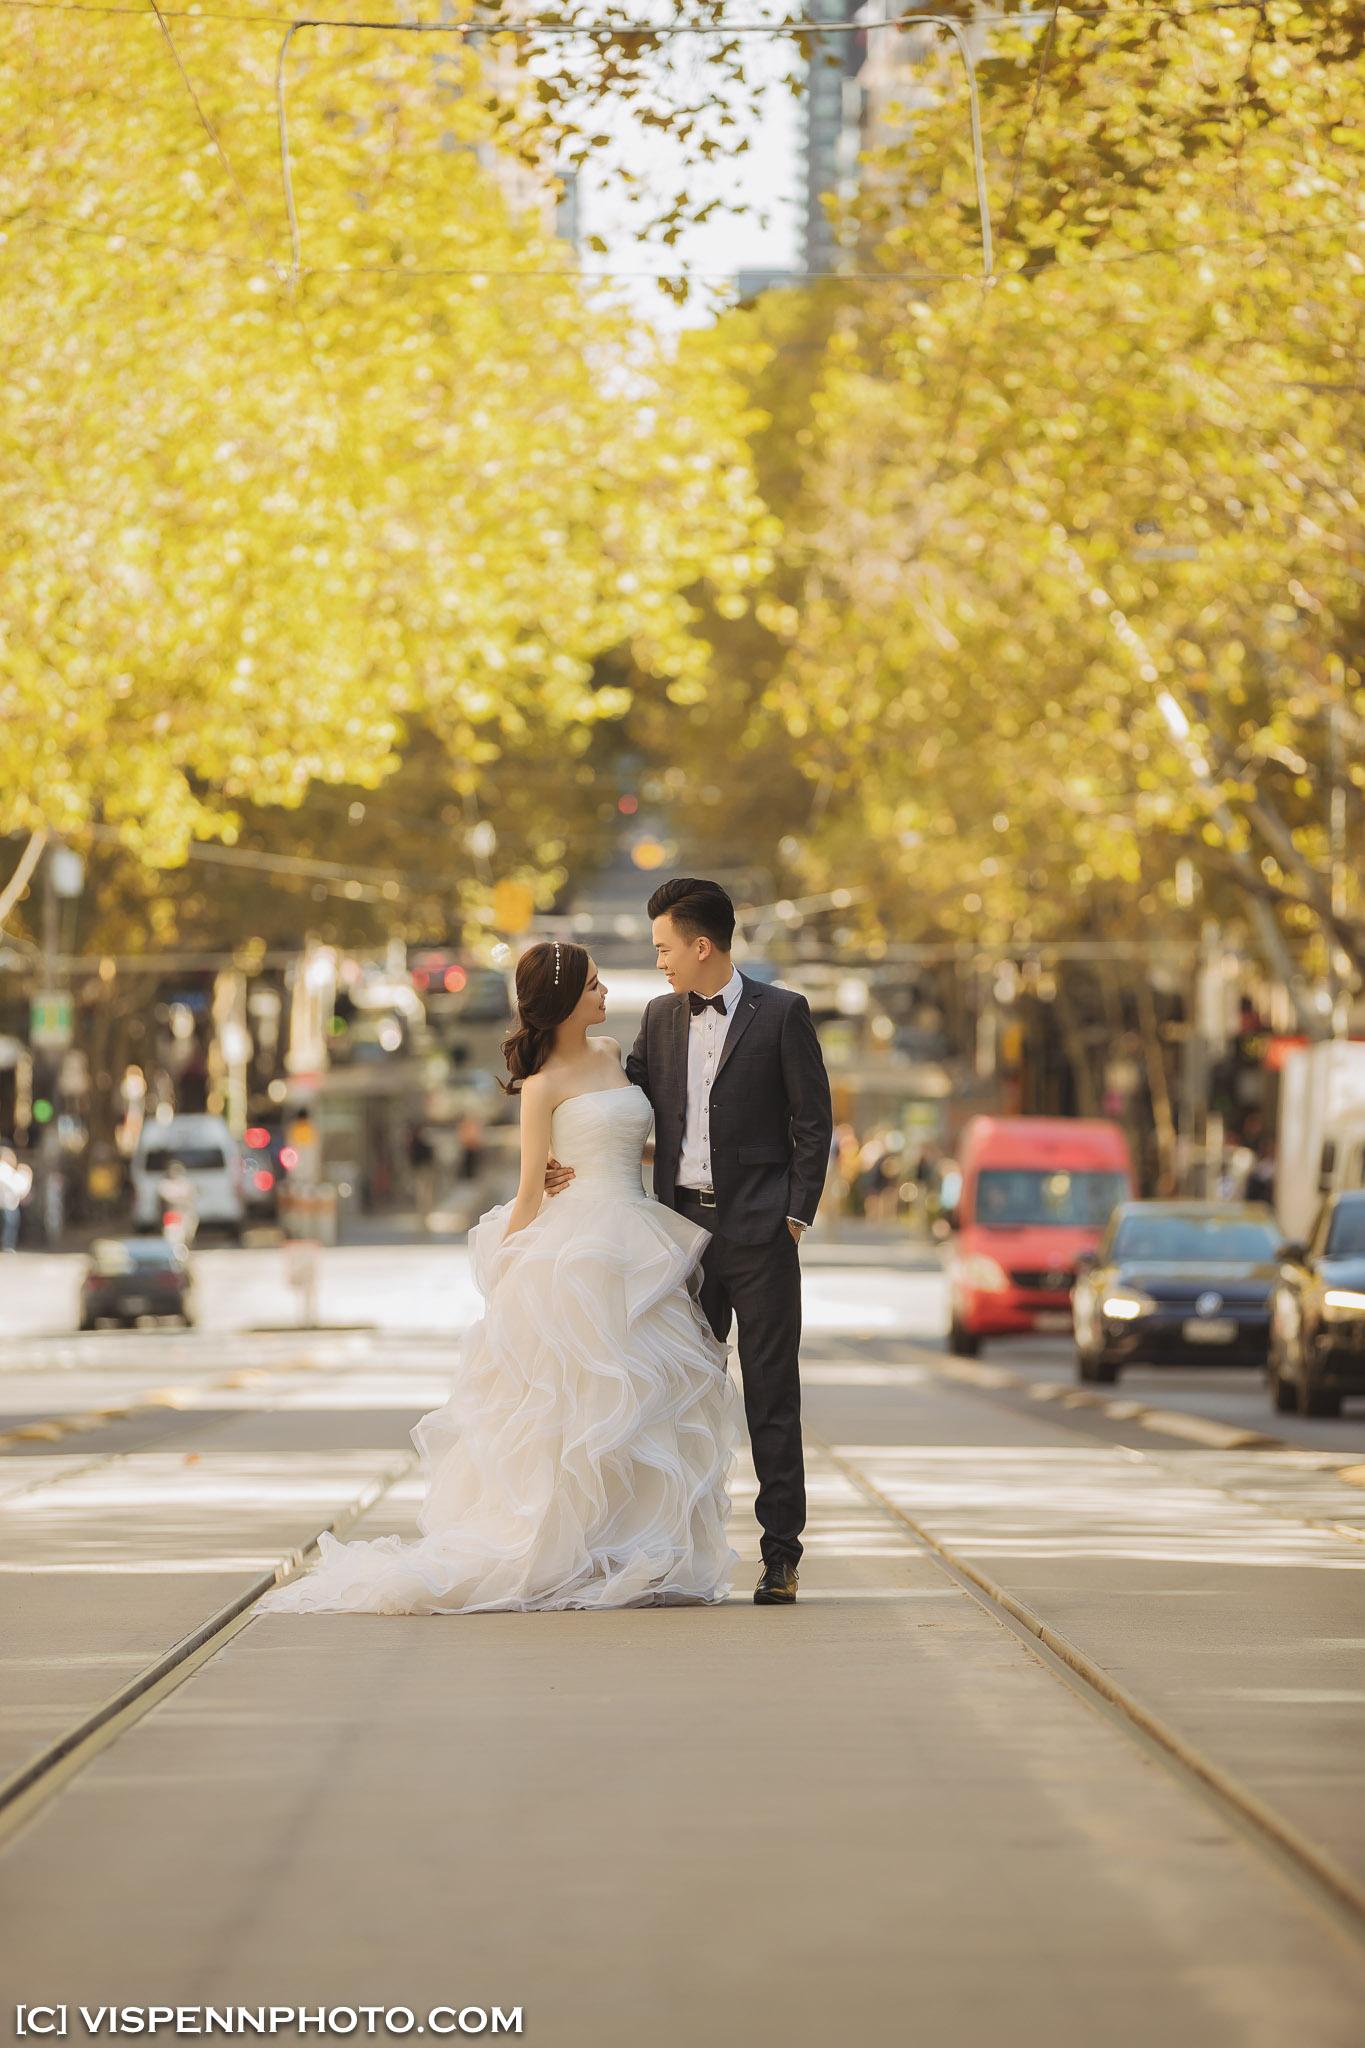 PRE WEDDING Photography Melbourne VISPENN 墨尔本 婚纱照 结婚照 婚纱摄影 AndyCHEN 3554 1DX VISPENN